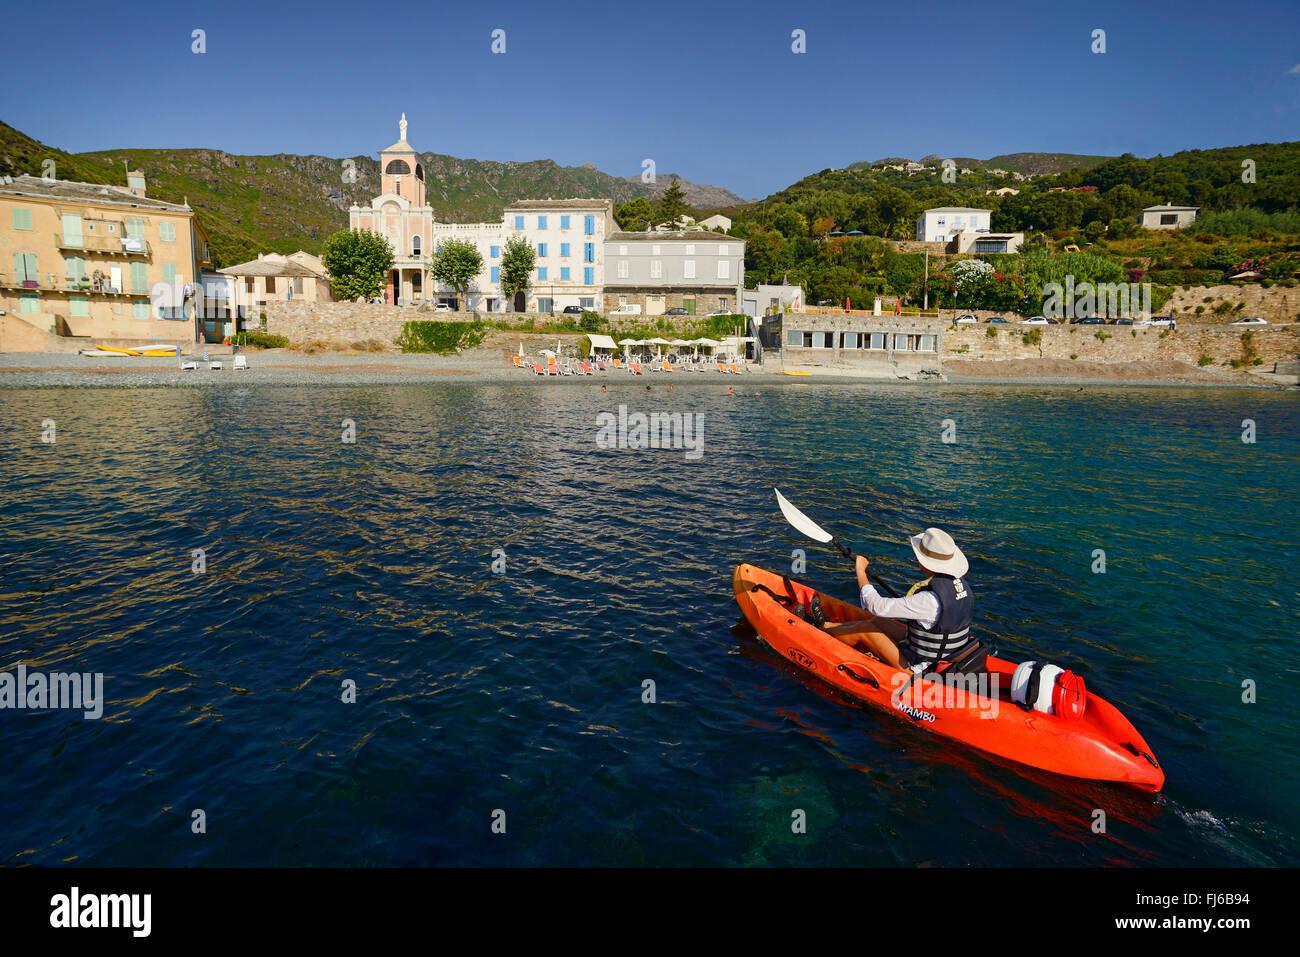 sea kayaking near Erbalunga, France, Corsica, Cap Corse, Erbalunga - Stock Image